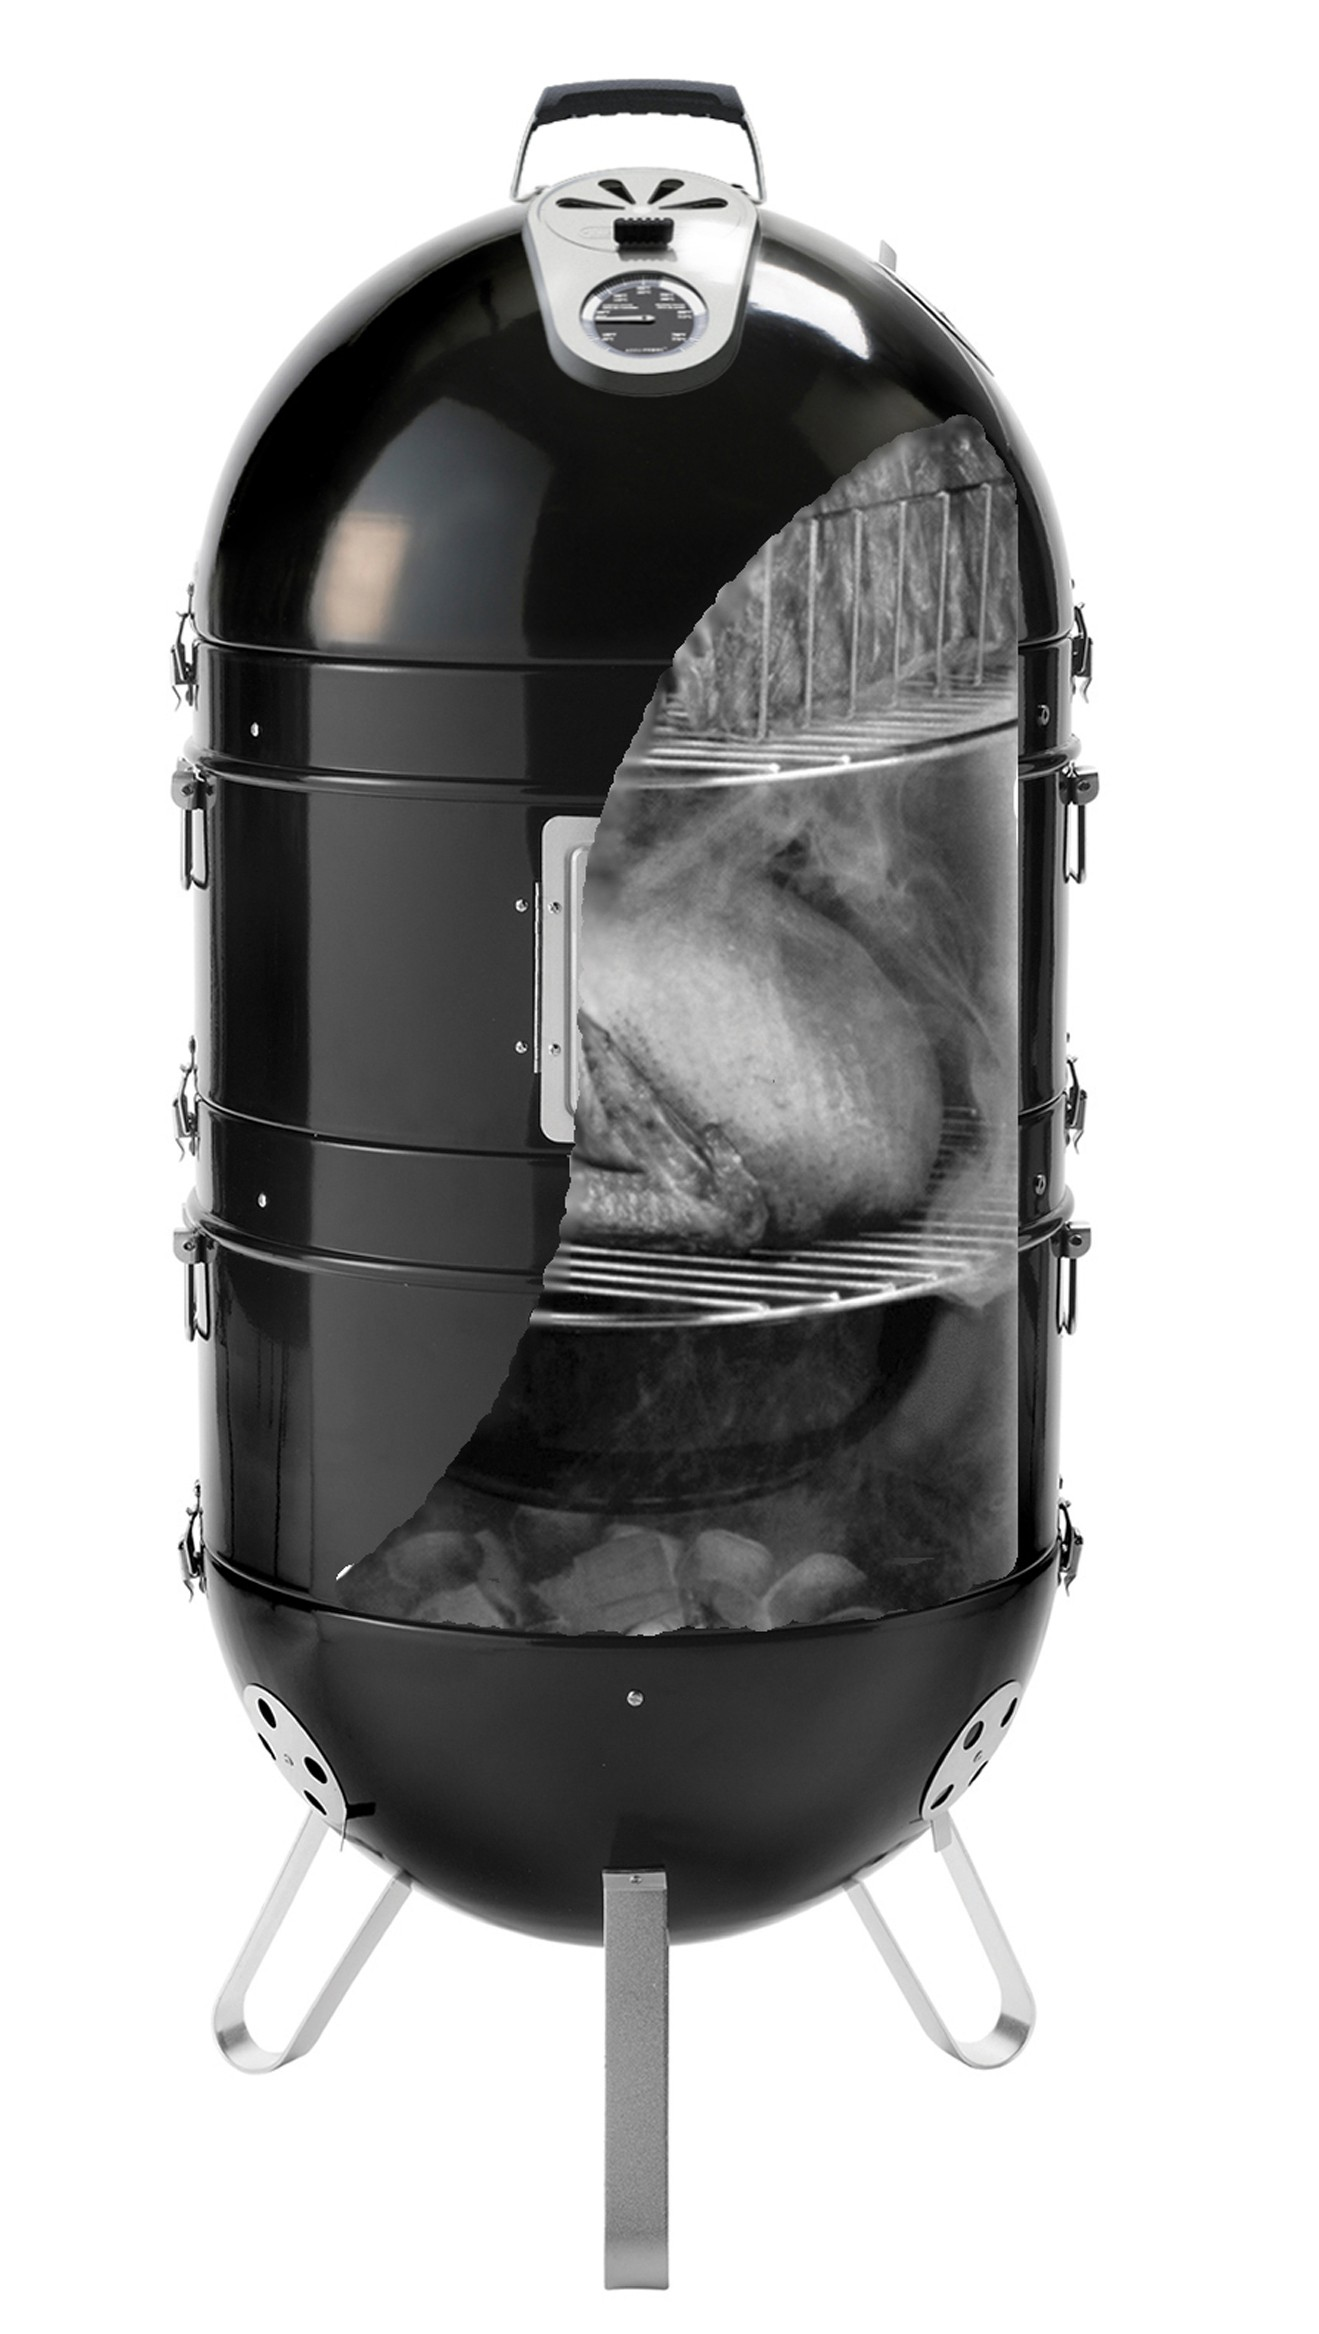 Kugelgrill / Holzkohle Grill Napoleon Apollo 3in1 Smoker AS300K Bild 4